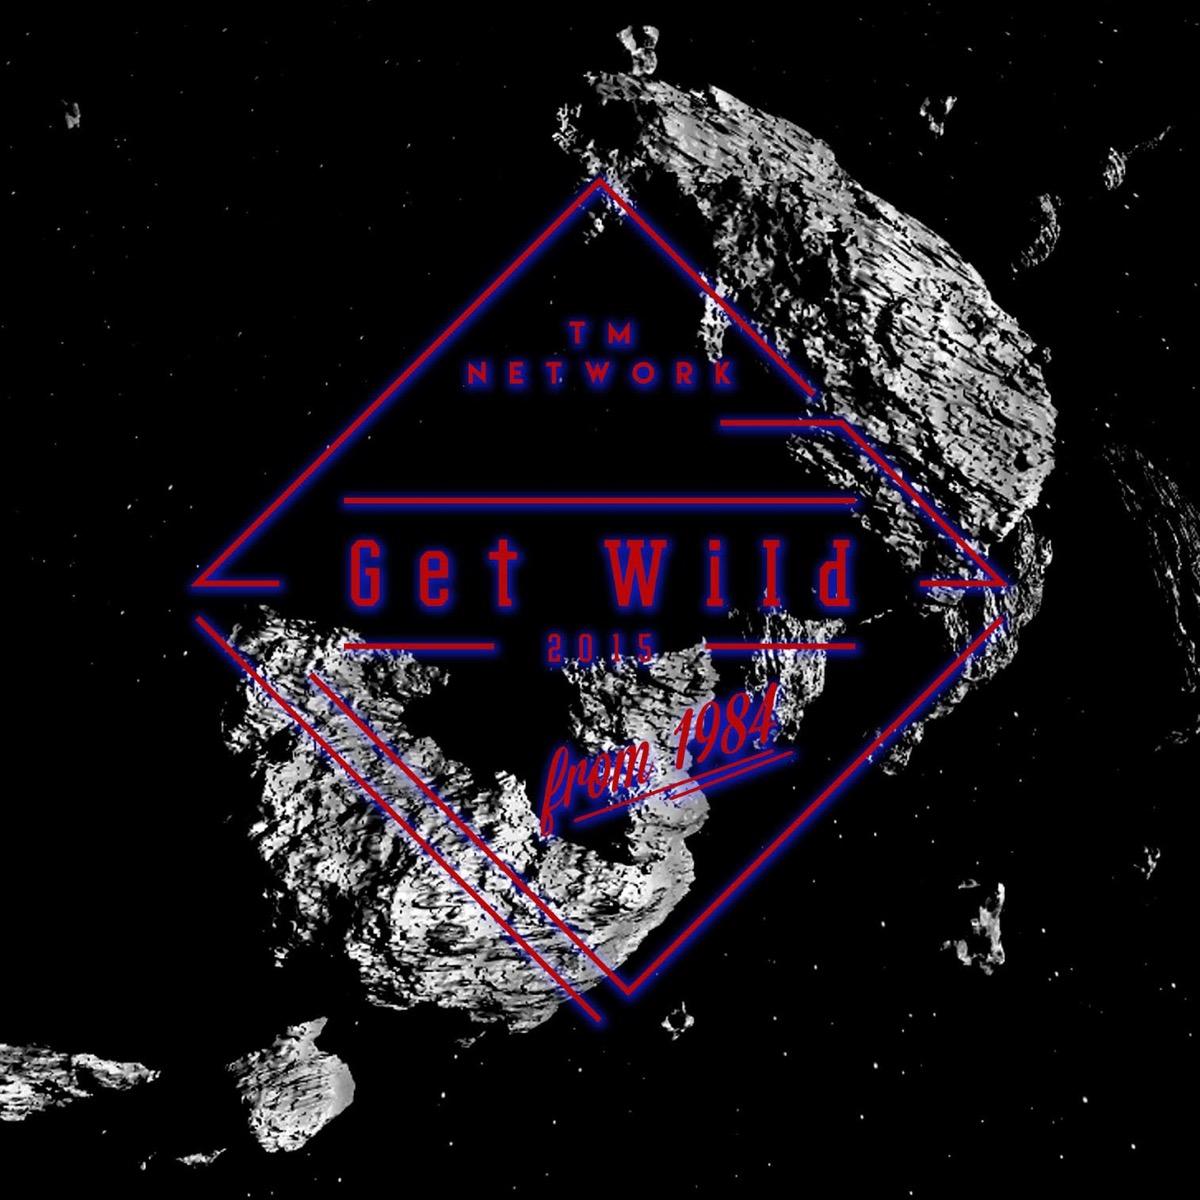 TM Network* TMN - Wild Heaven